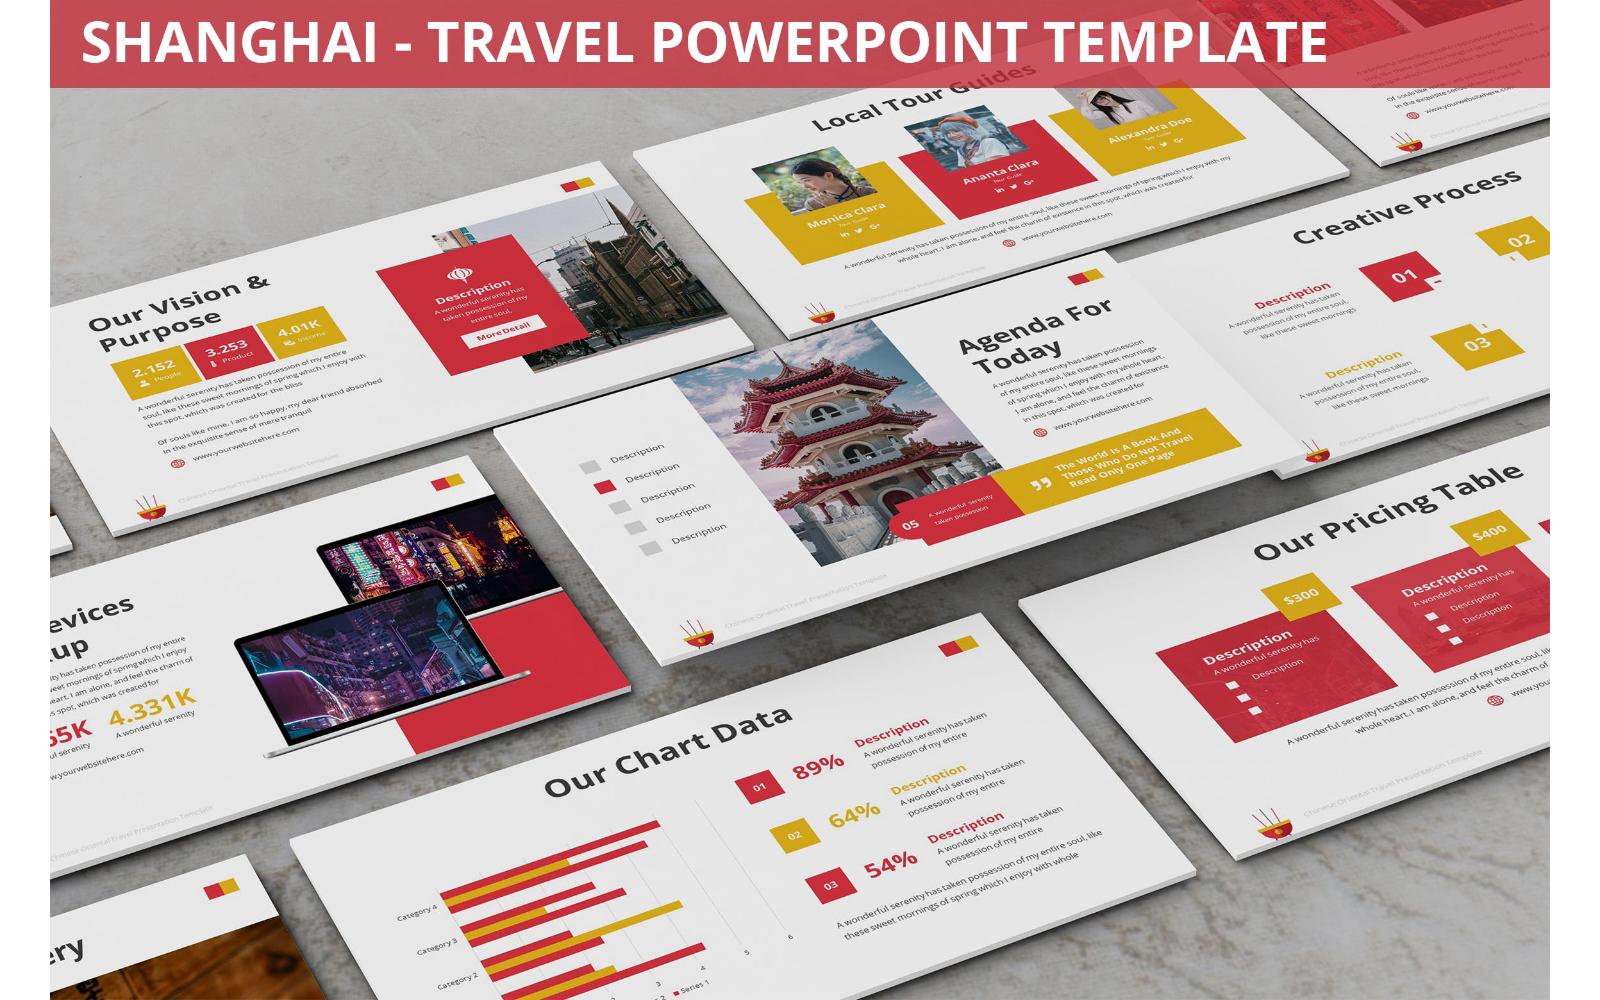 Shanghai - Travel Powerpoint Template